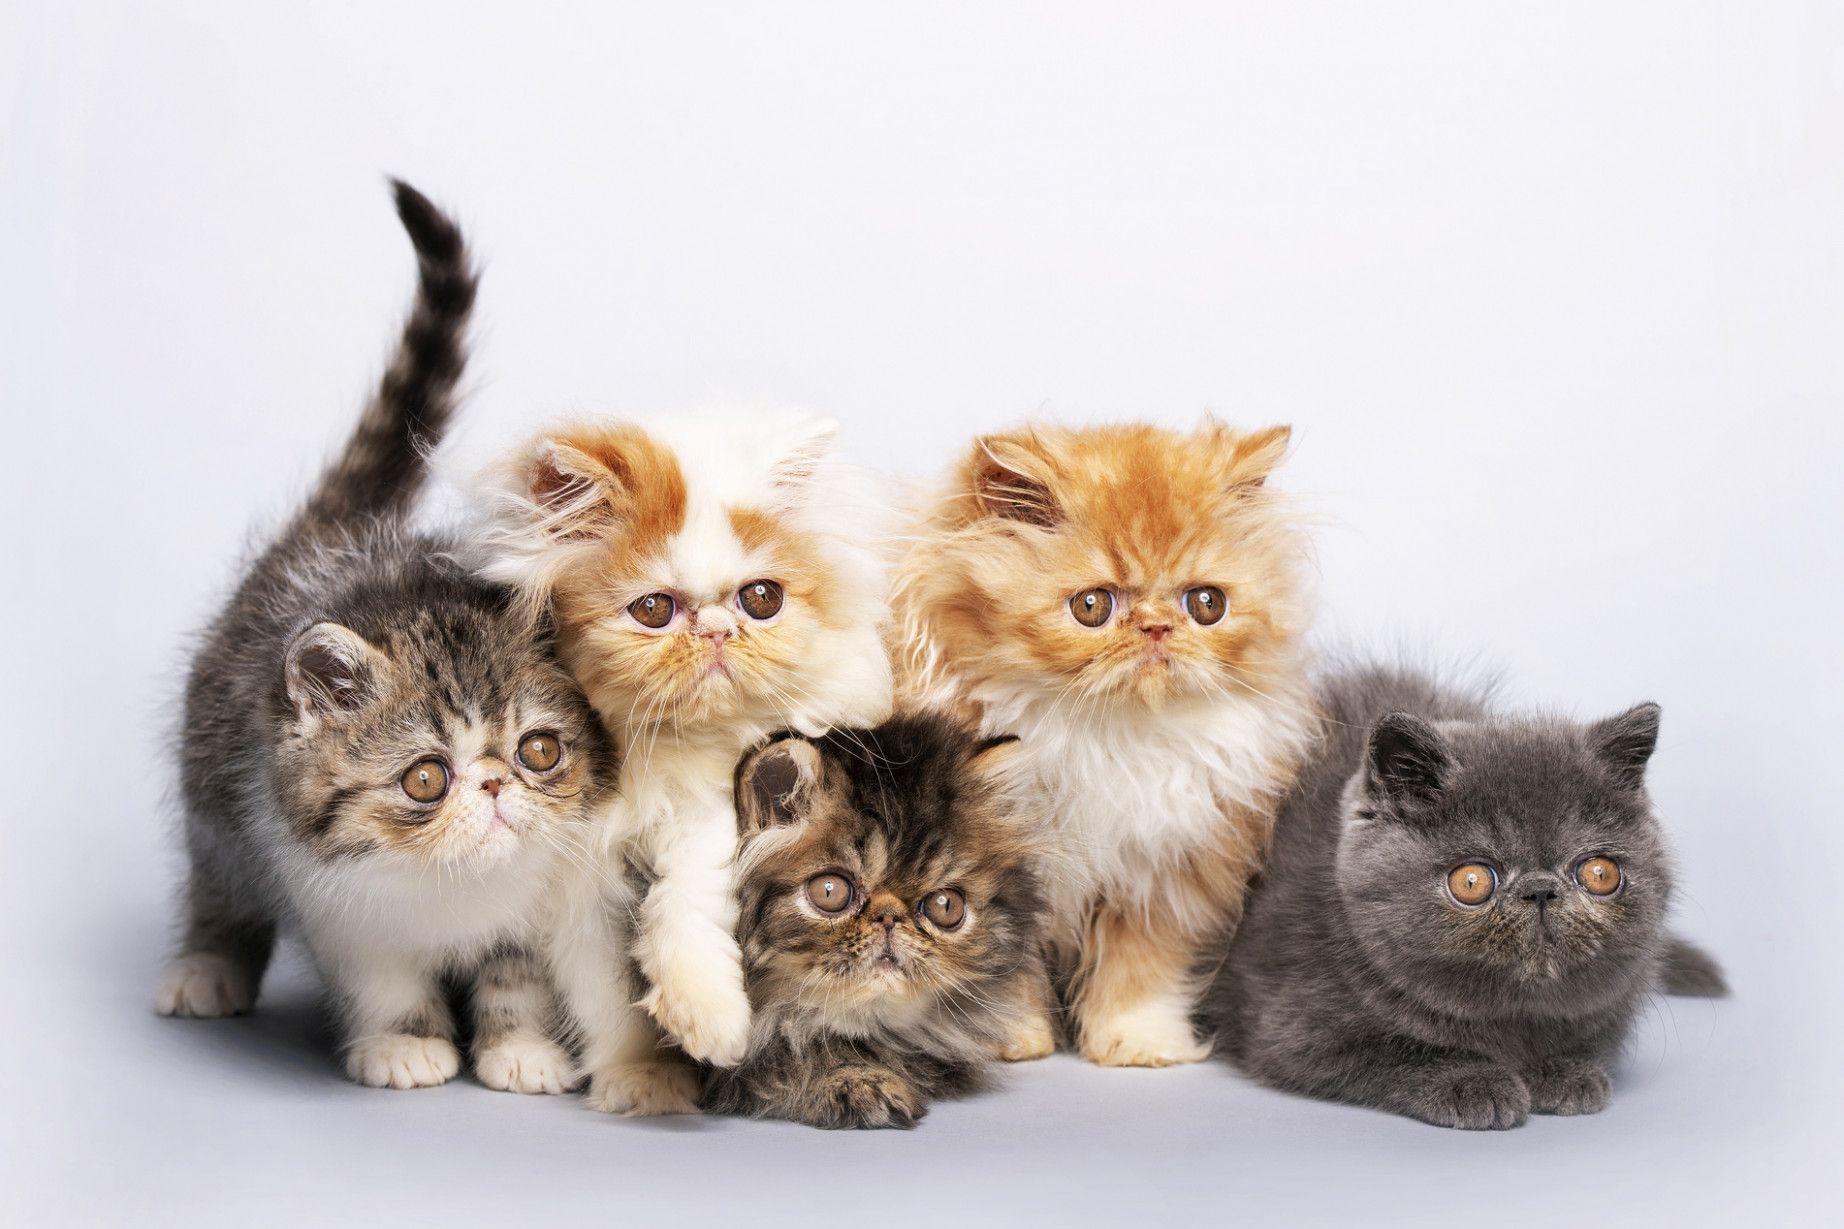 12 Persian Cat Craigslist Image in 2020 Persian cats for